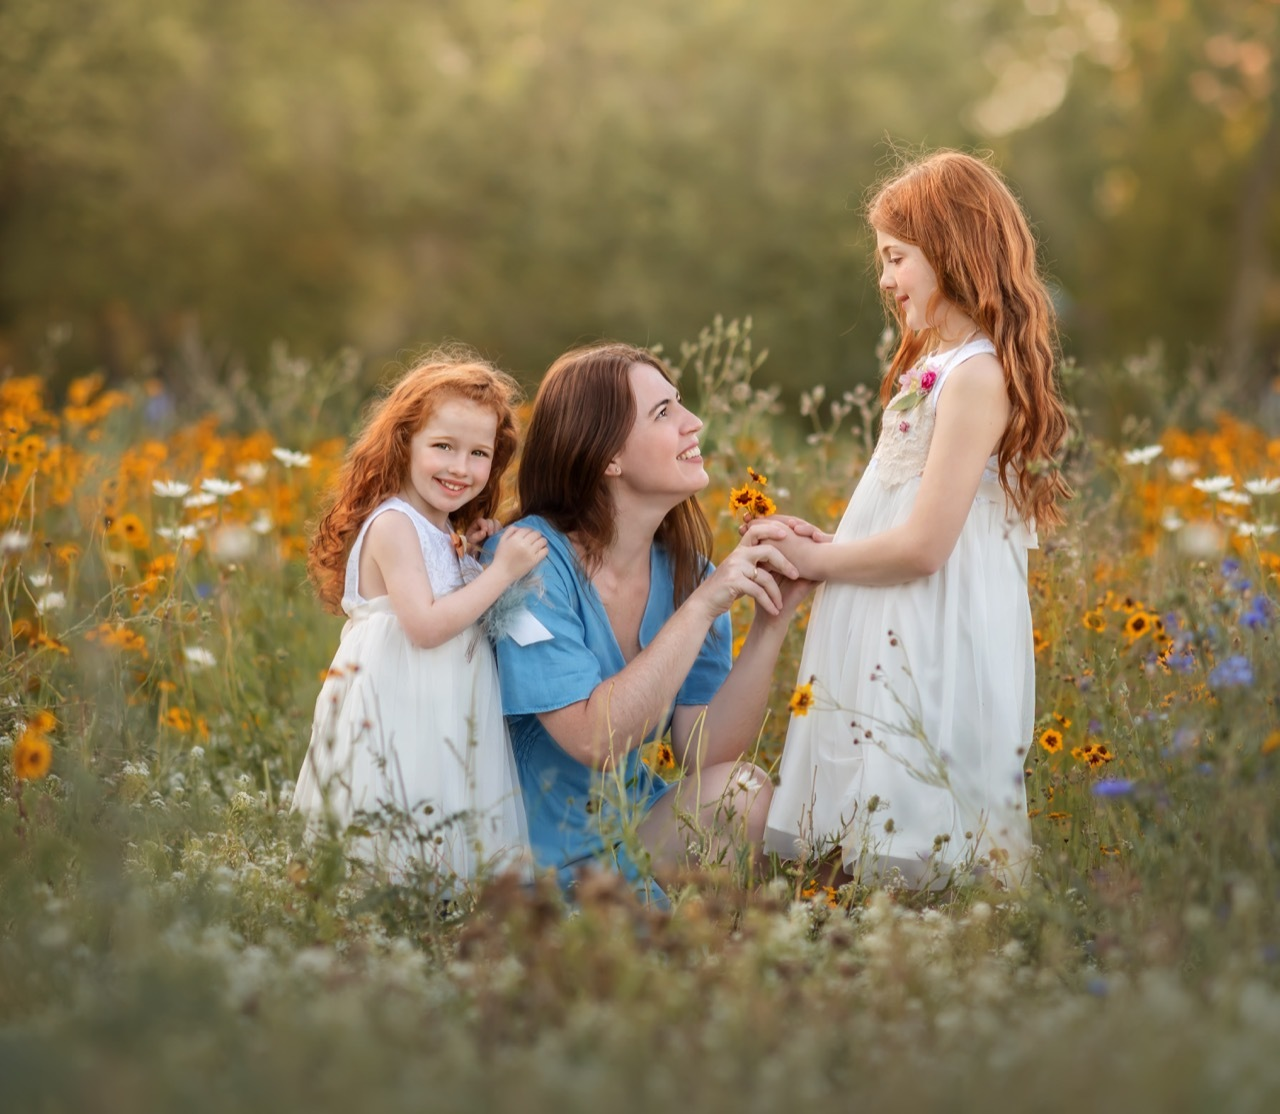 Contate Fotografa Infantil